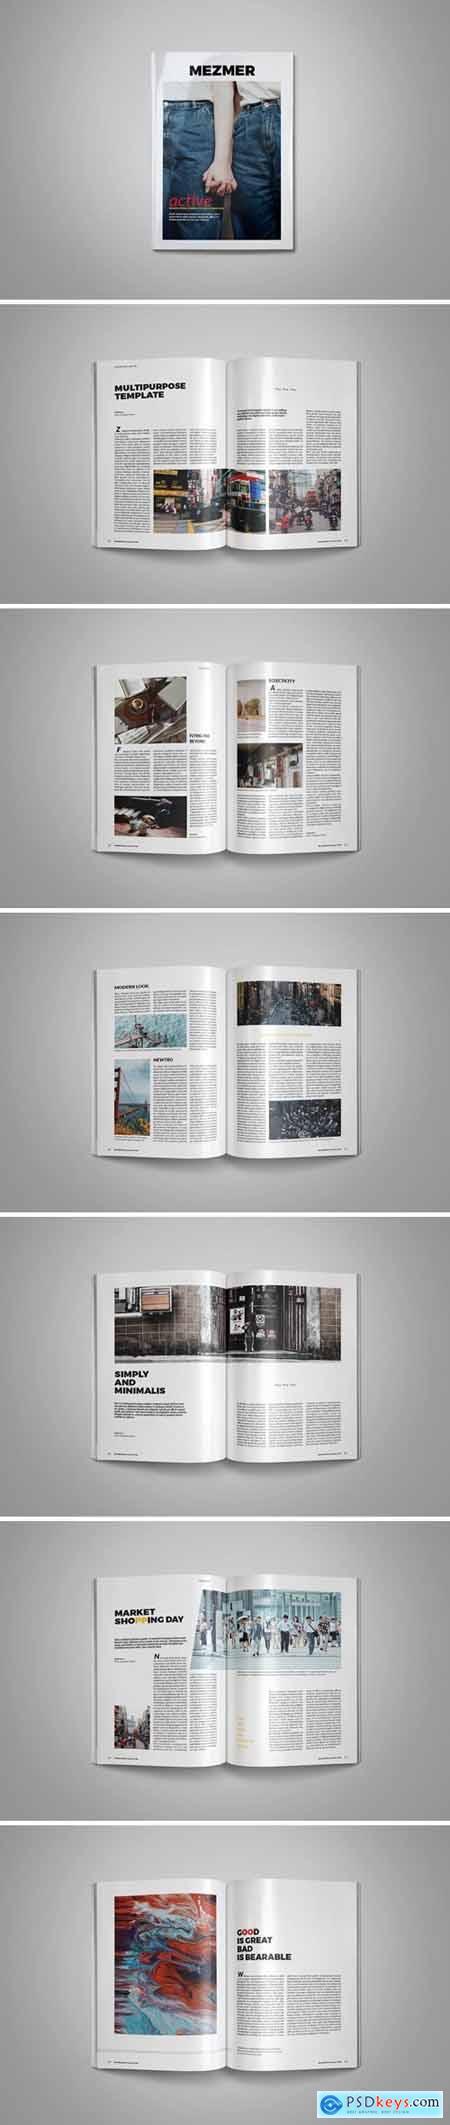 Magazine Template 001